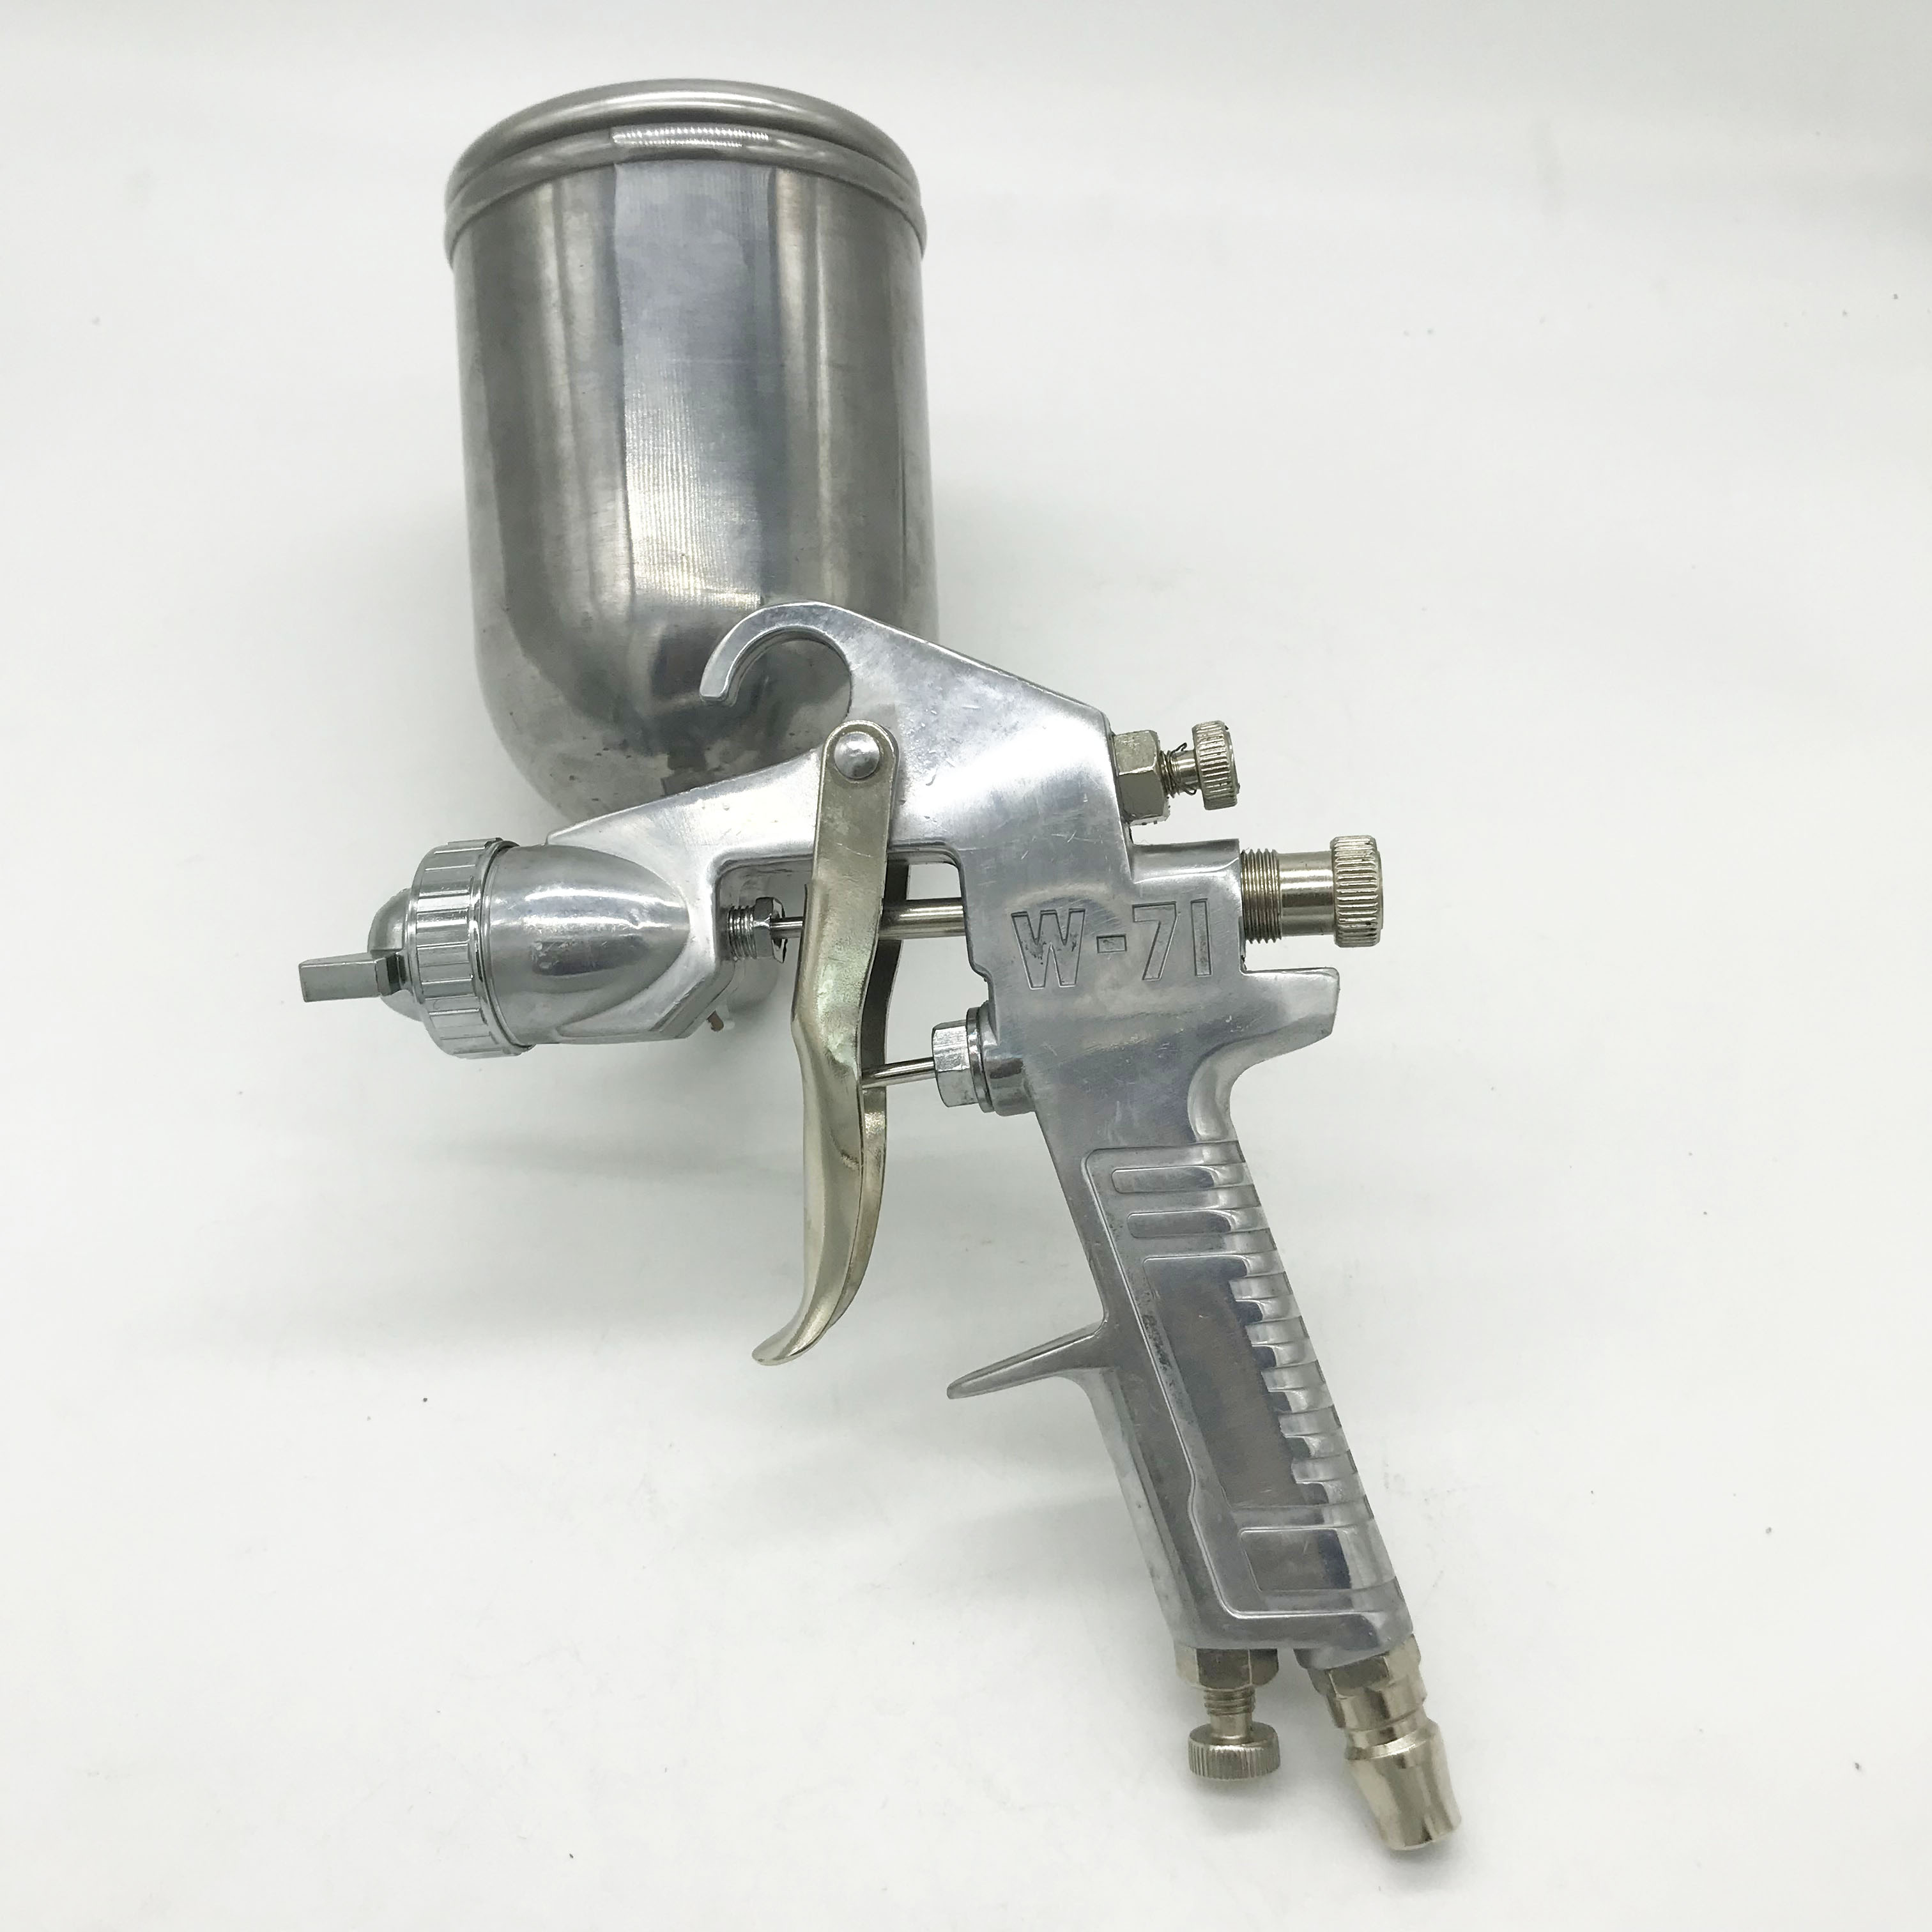 DEWABISS W71G Spray Paint Gun 1.5mm Airbrush Airless Spray Gun For Painting Cars Pneumatic Tool Air Brush